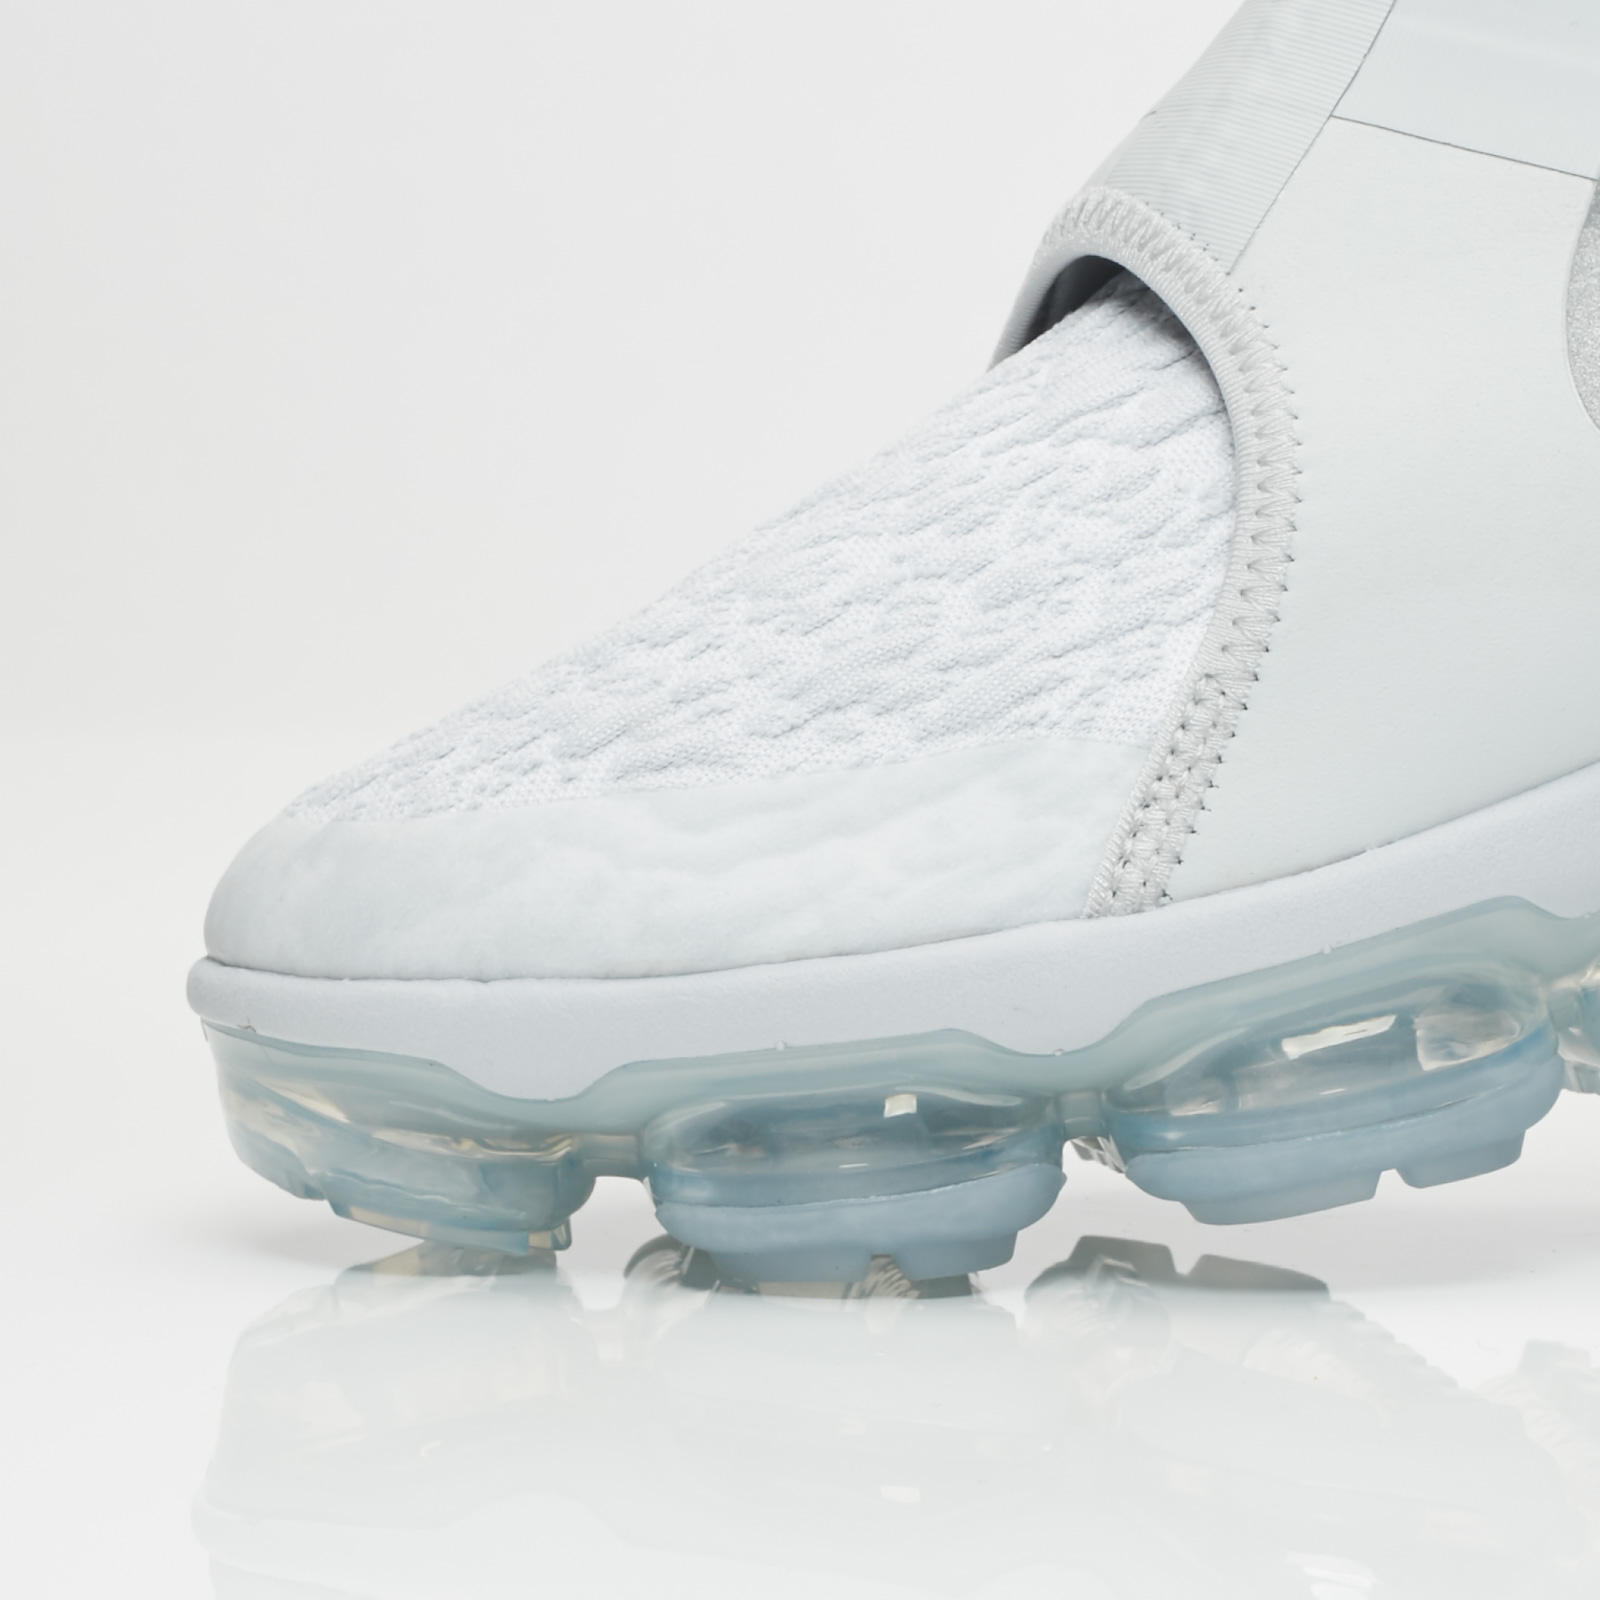 1c2ed213d34 Nike Nike Air Vapormax Chukka Slip - Ao9326-001 - Sneakersnstuff ...